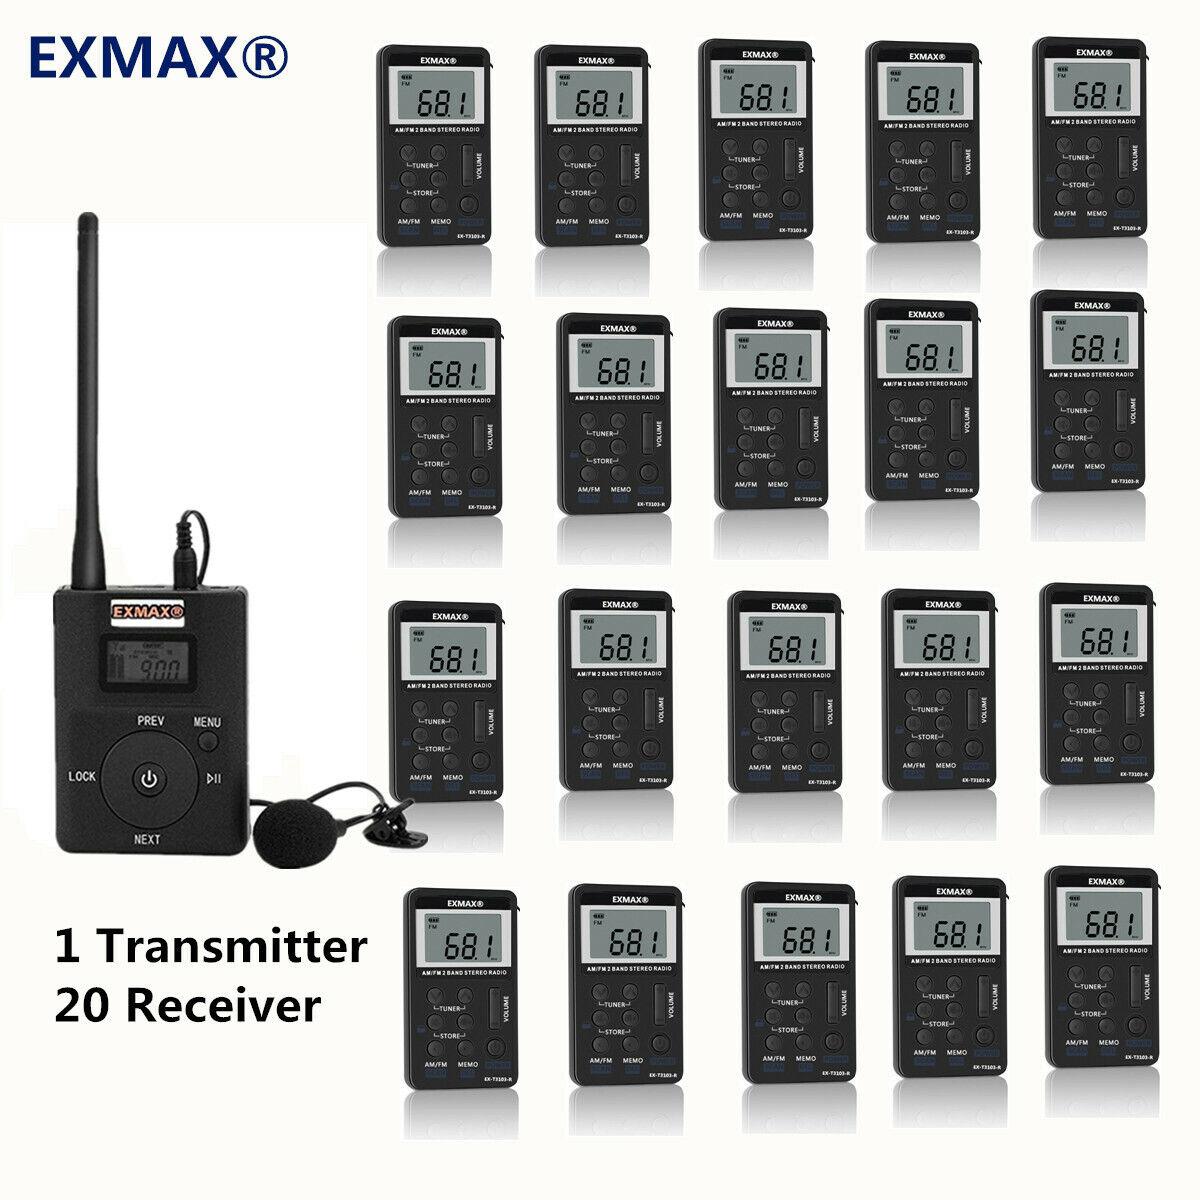 EXMAX Wireless Tour Guide Audio Mikrofon System 1 Transmitter 20 FM Receiver